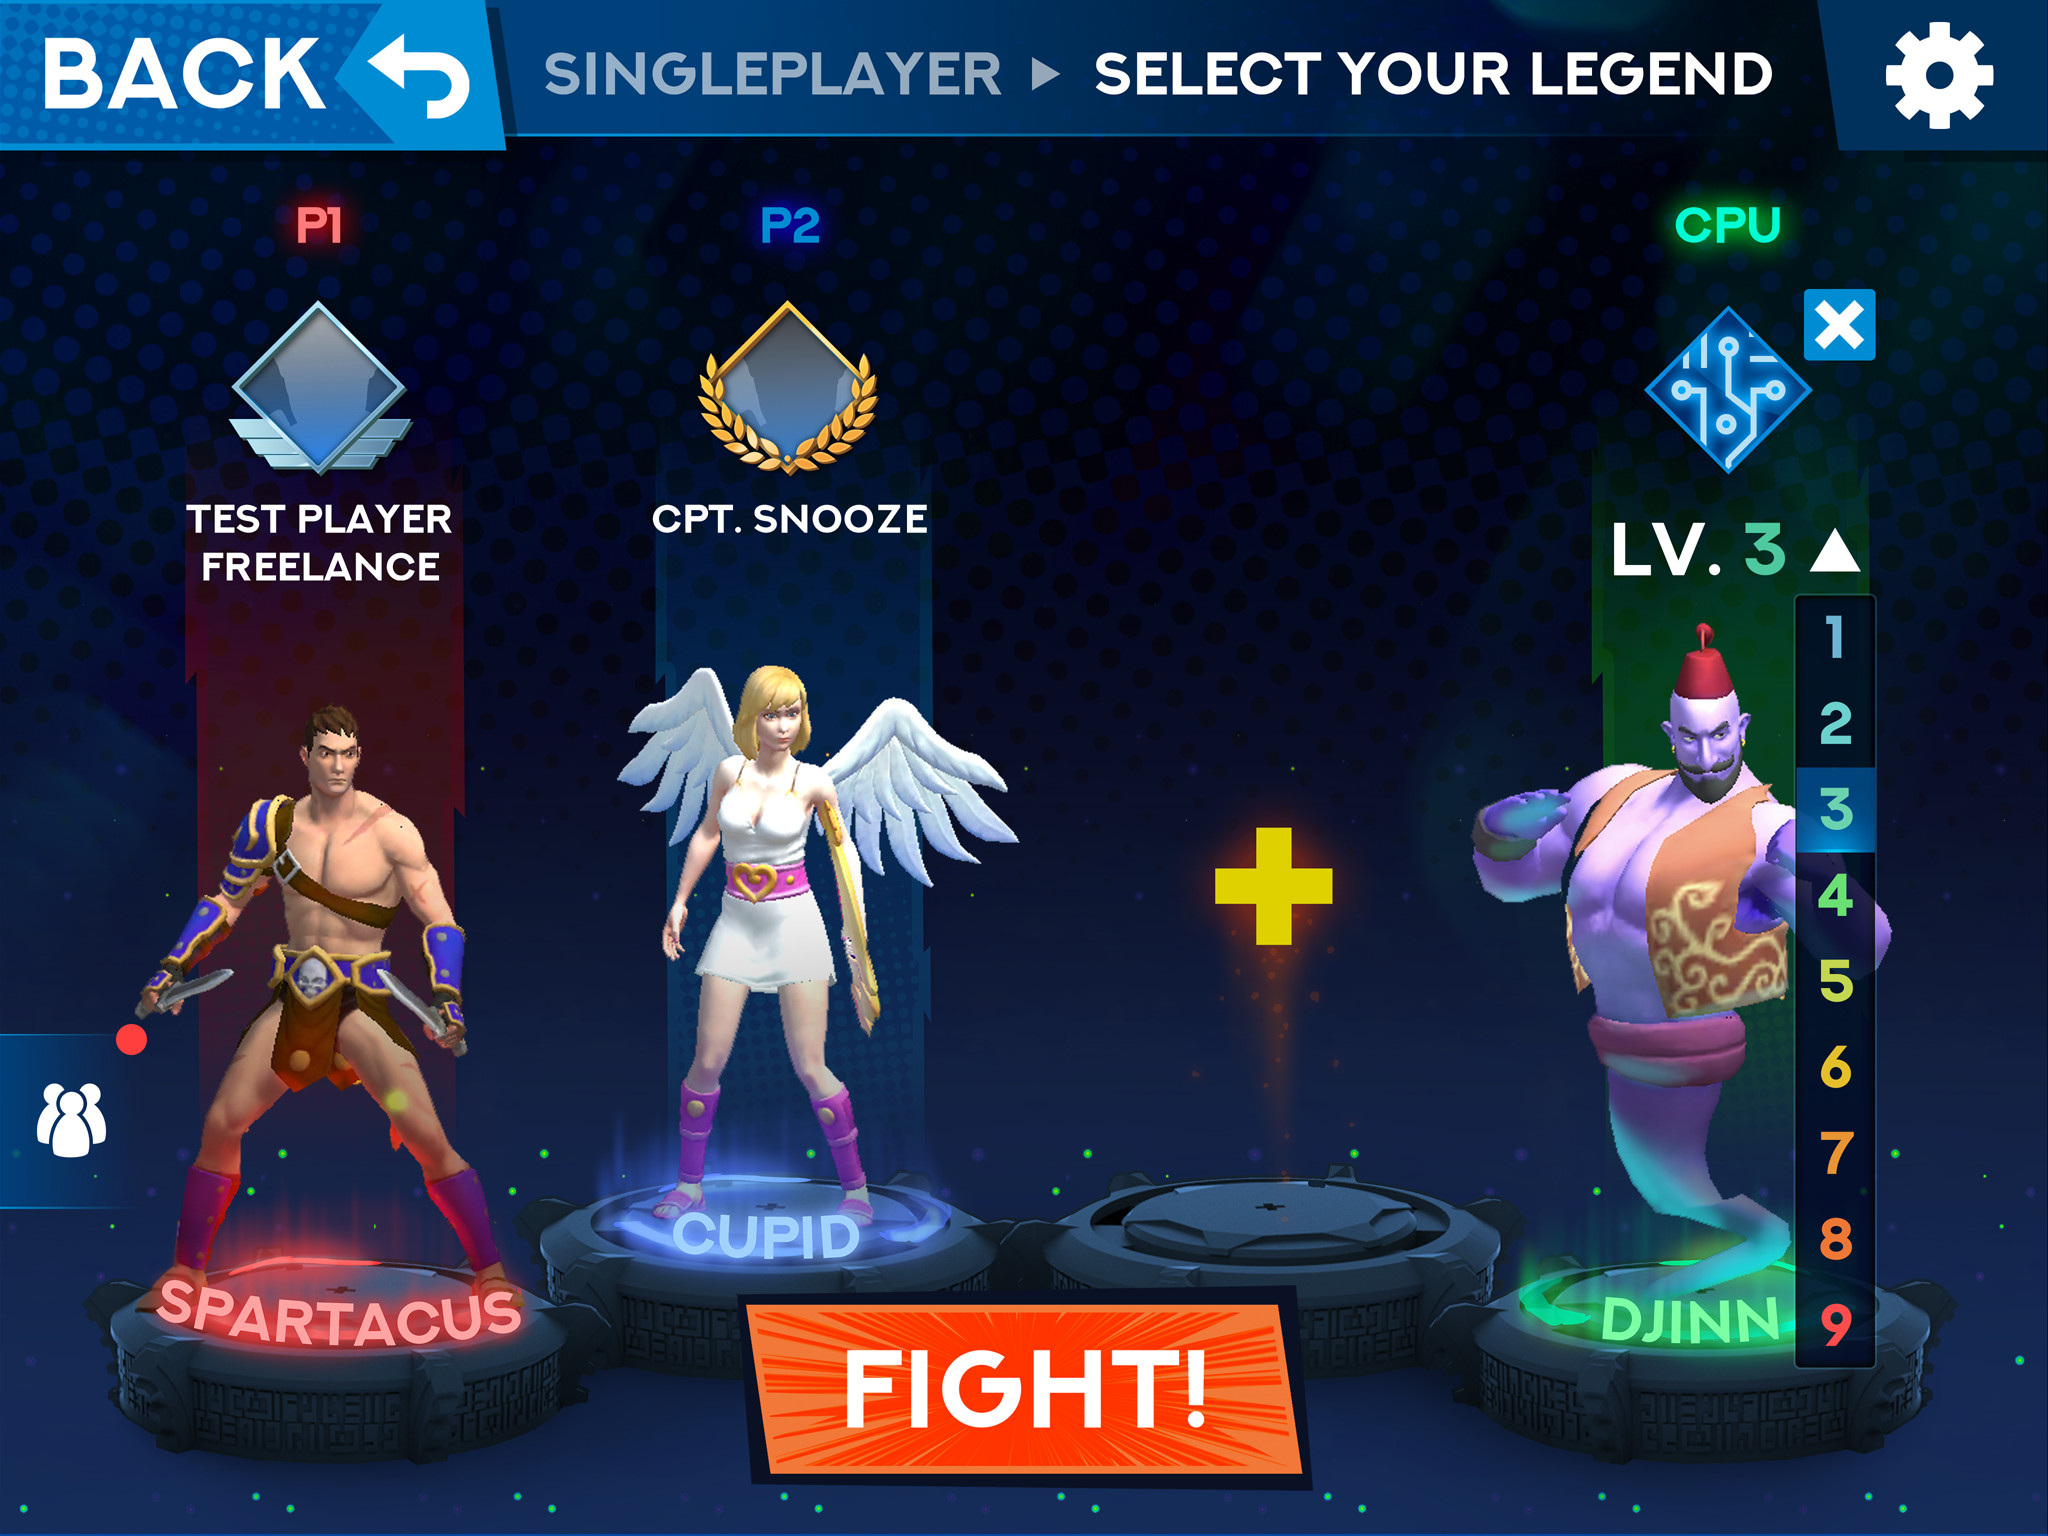 pre-battle UI